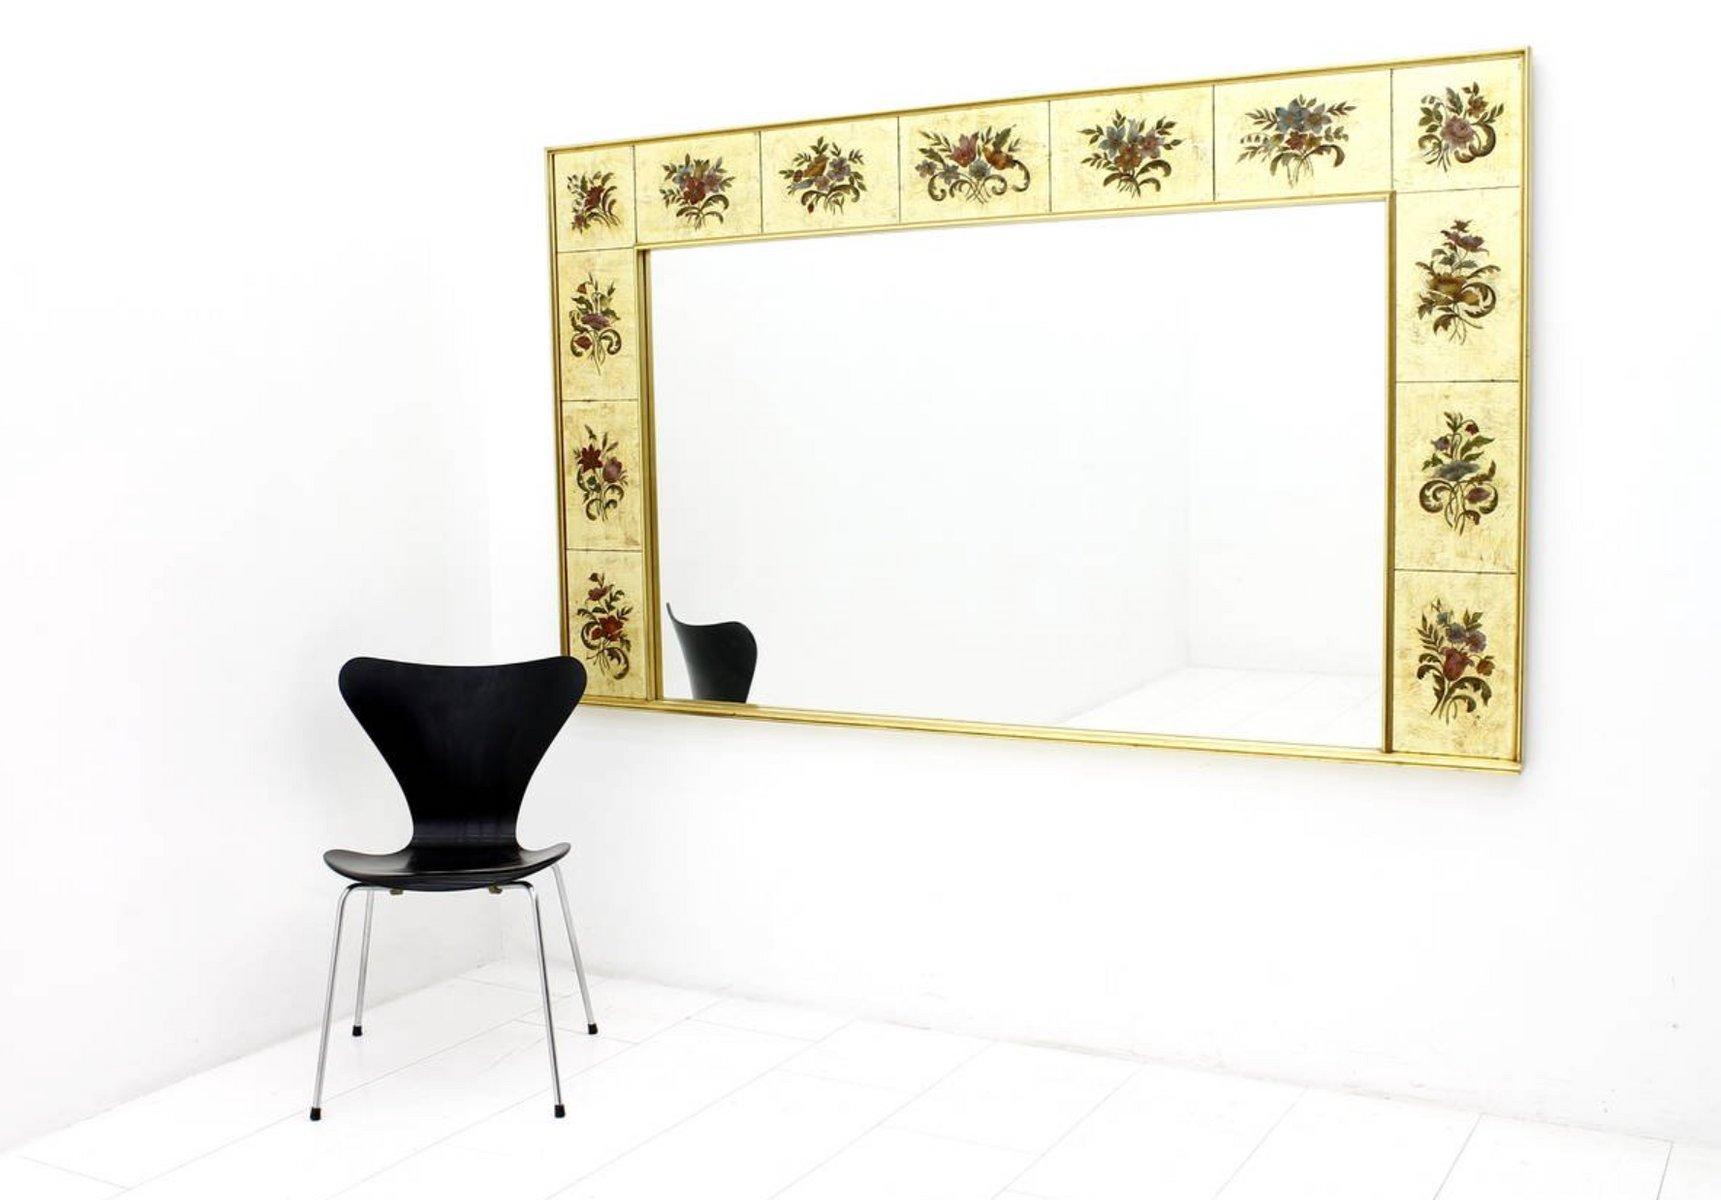 grand miroir mural decoratif 1980s 2 Résultat Supérieur 16 Unique Grand Miroir Mural Decoratif Pic 2017 Iqt4